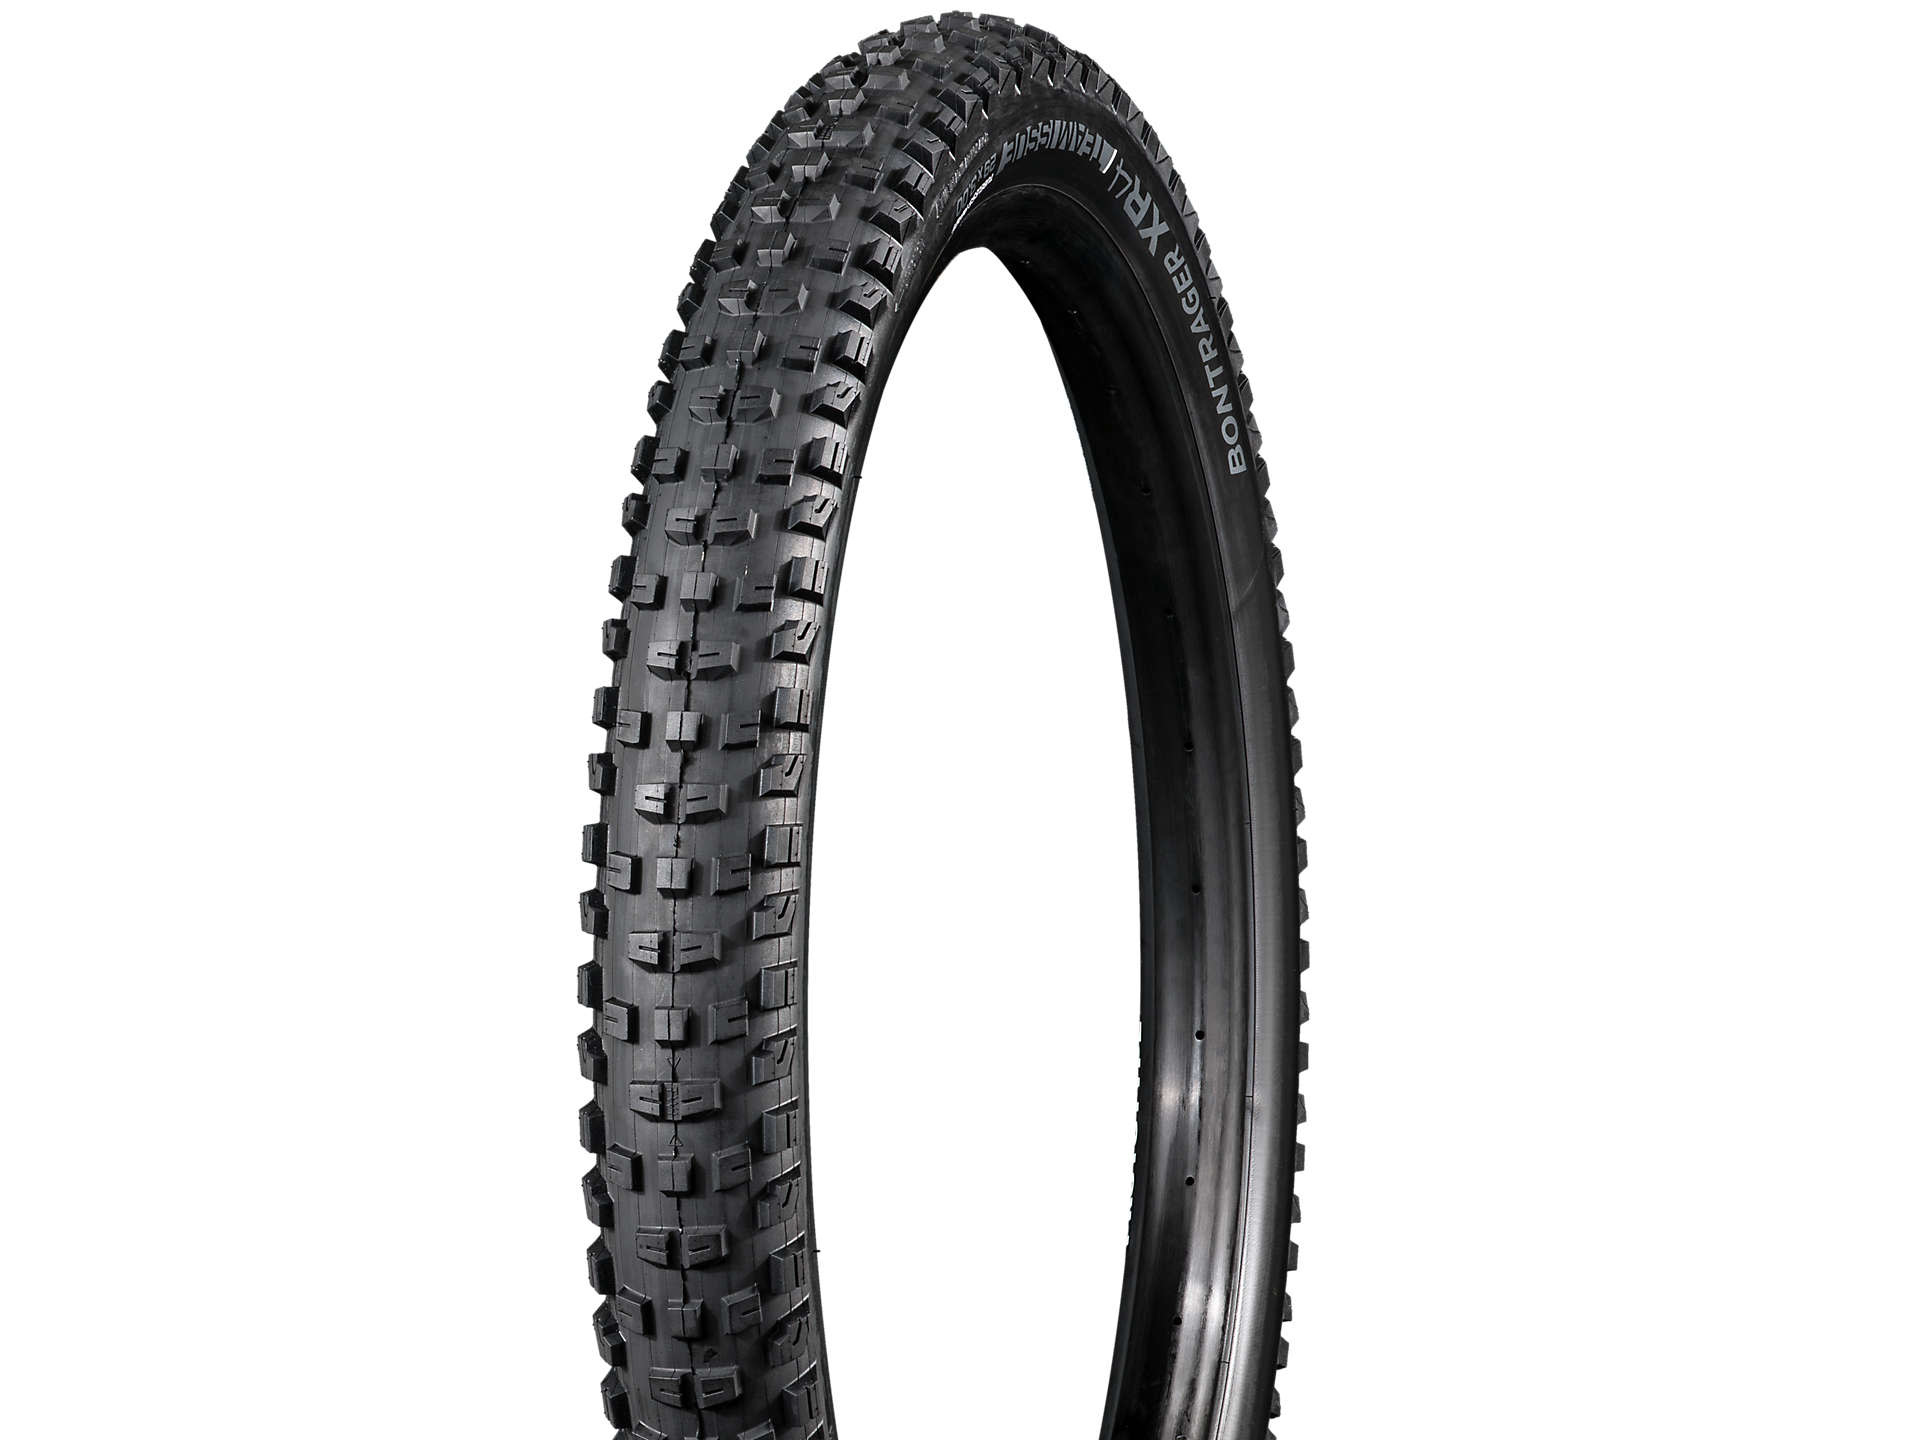 Bontrager XR4 29 x 3.0 Black Tubeless Ready Tire